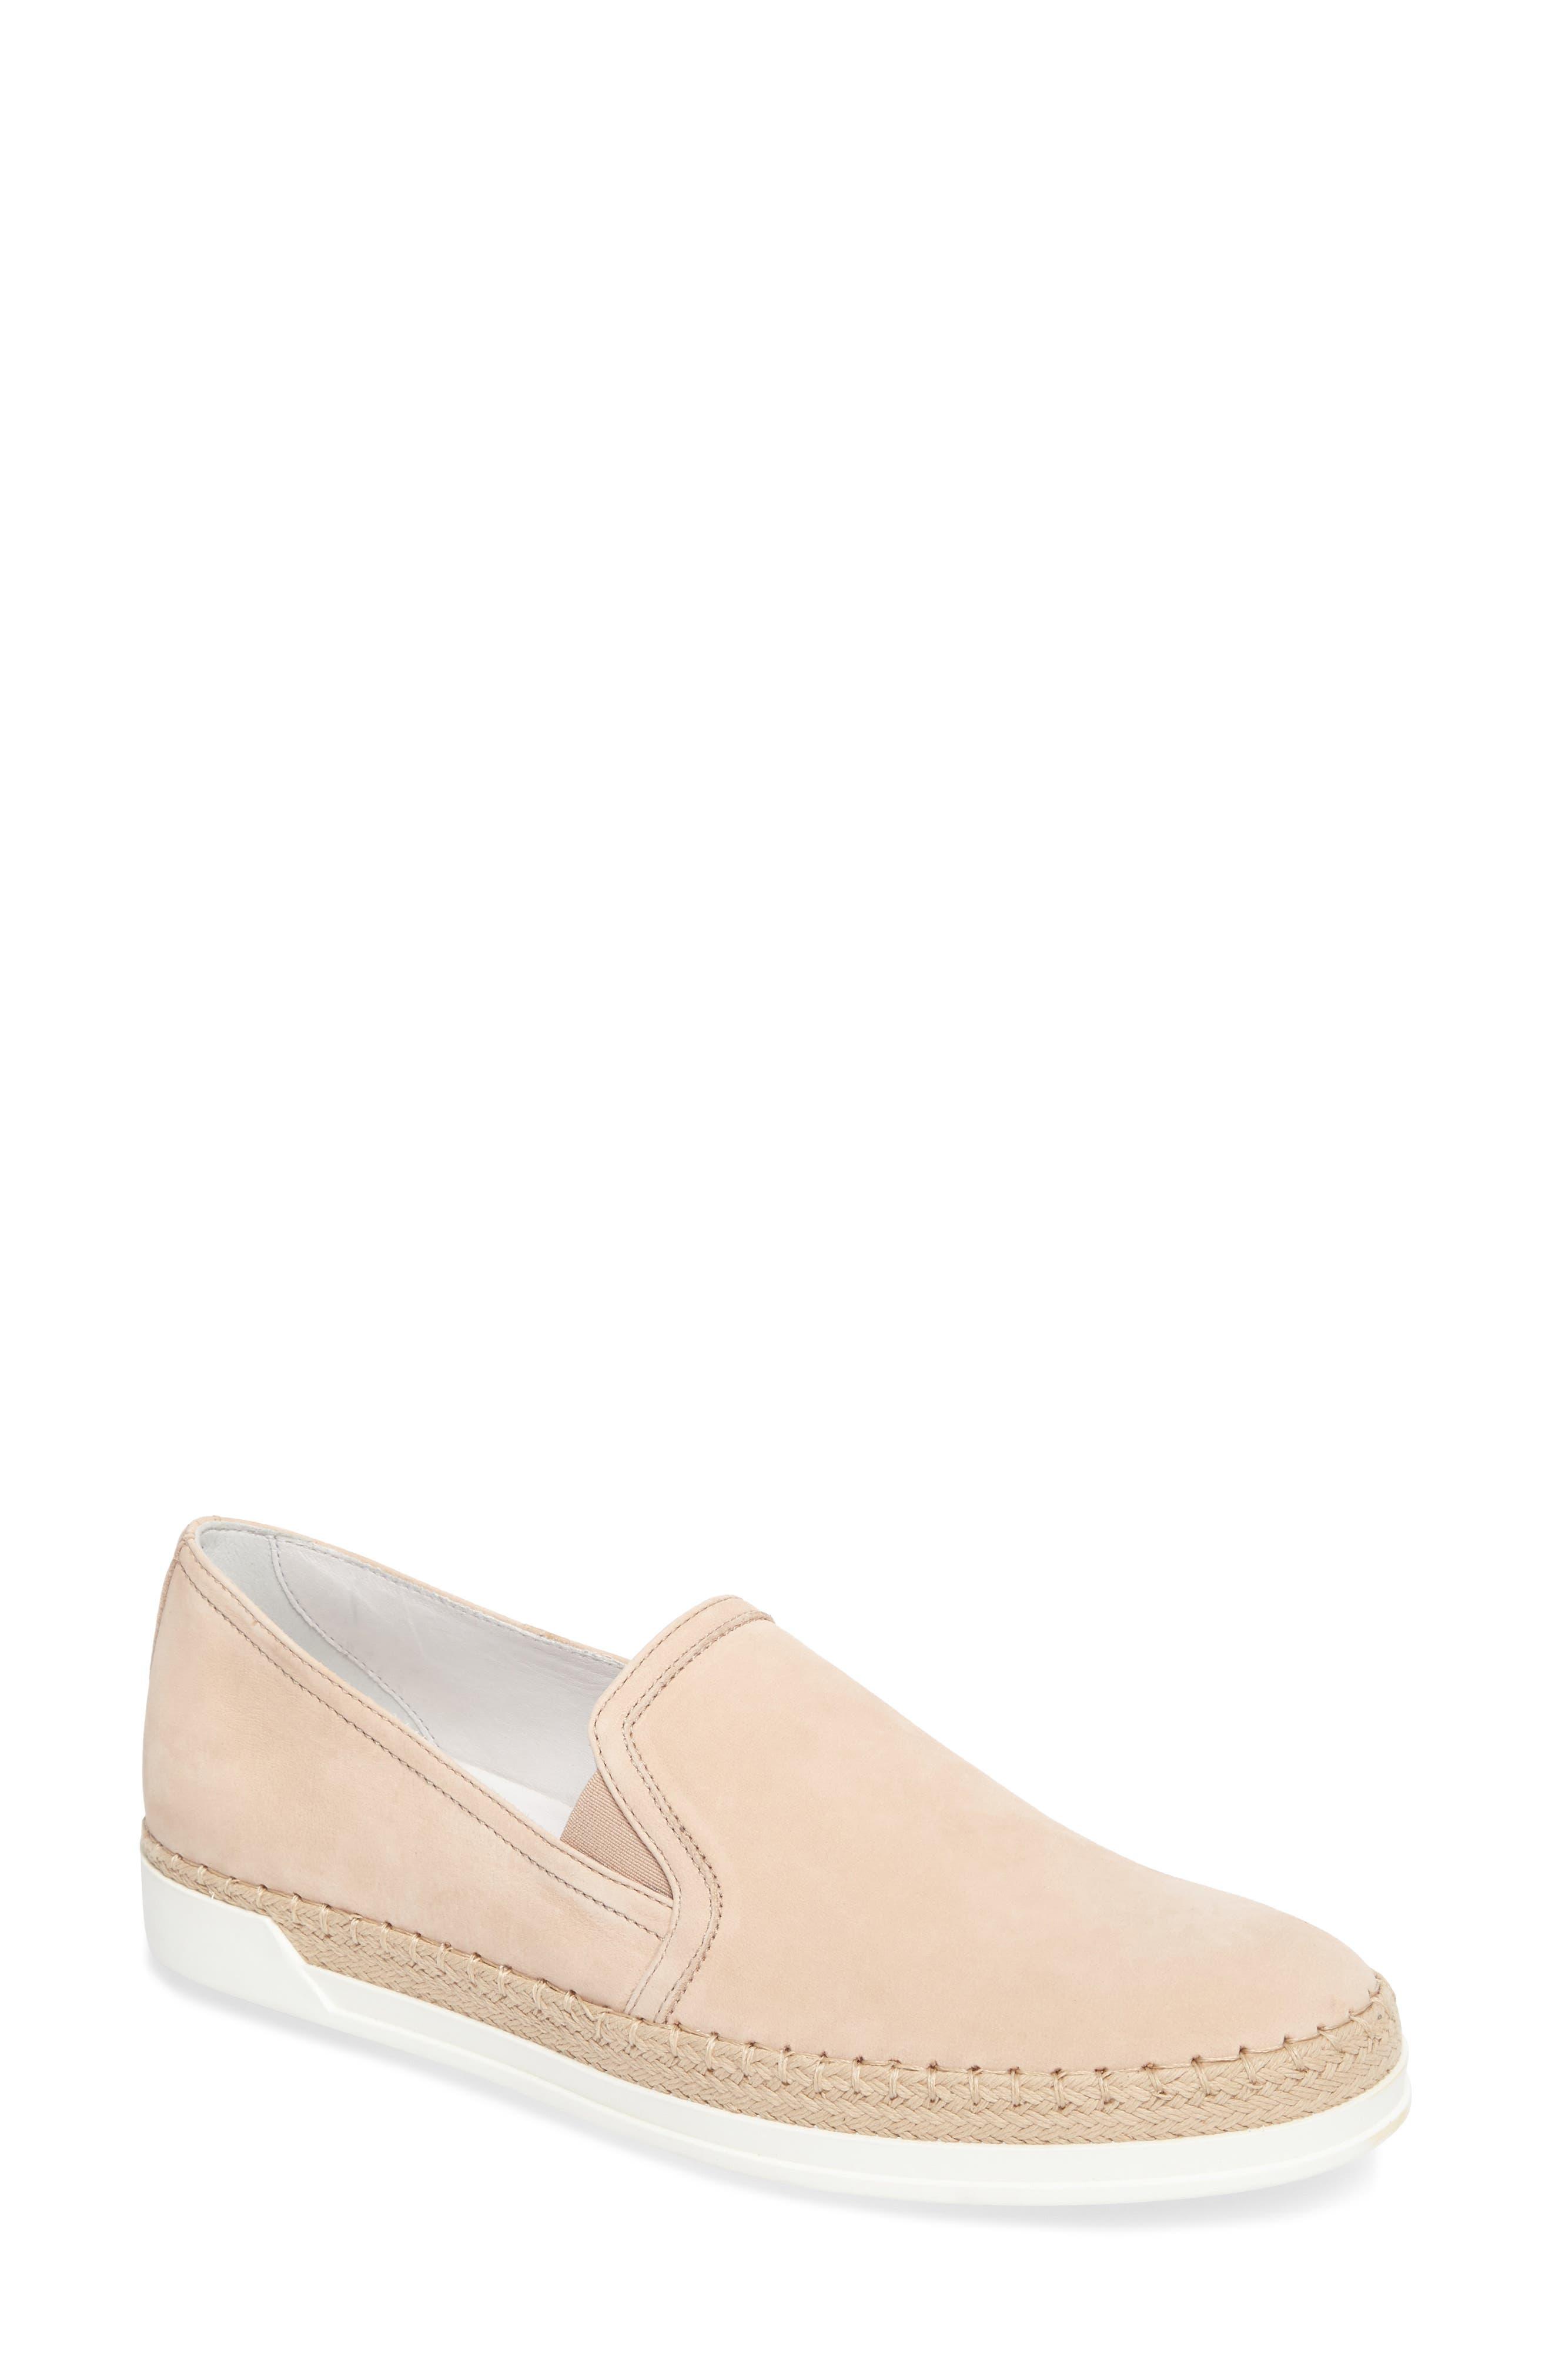 Espadrille Slip-On Sneaker,                         Main,                         color, Ballerina Pink